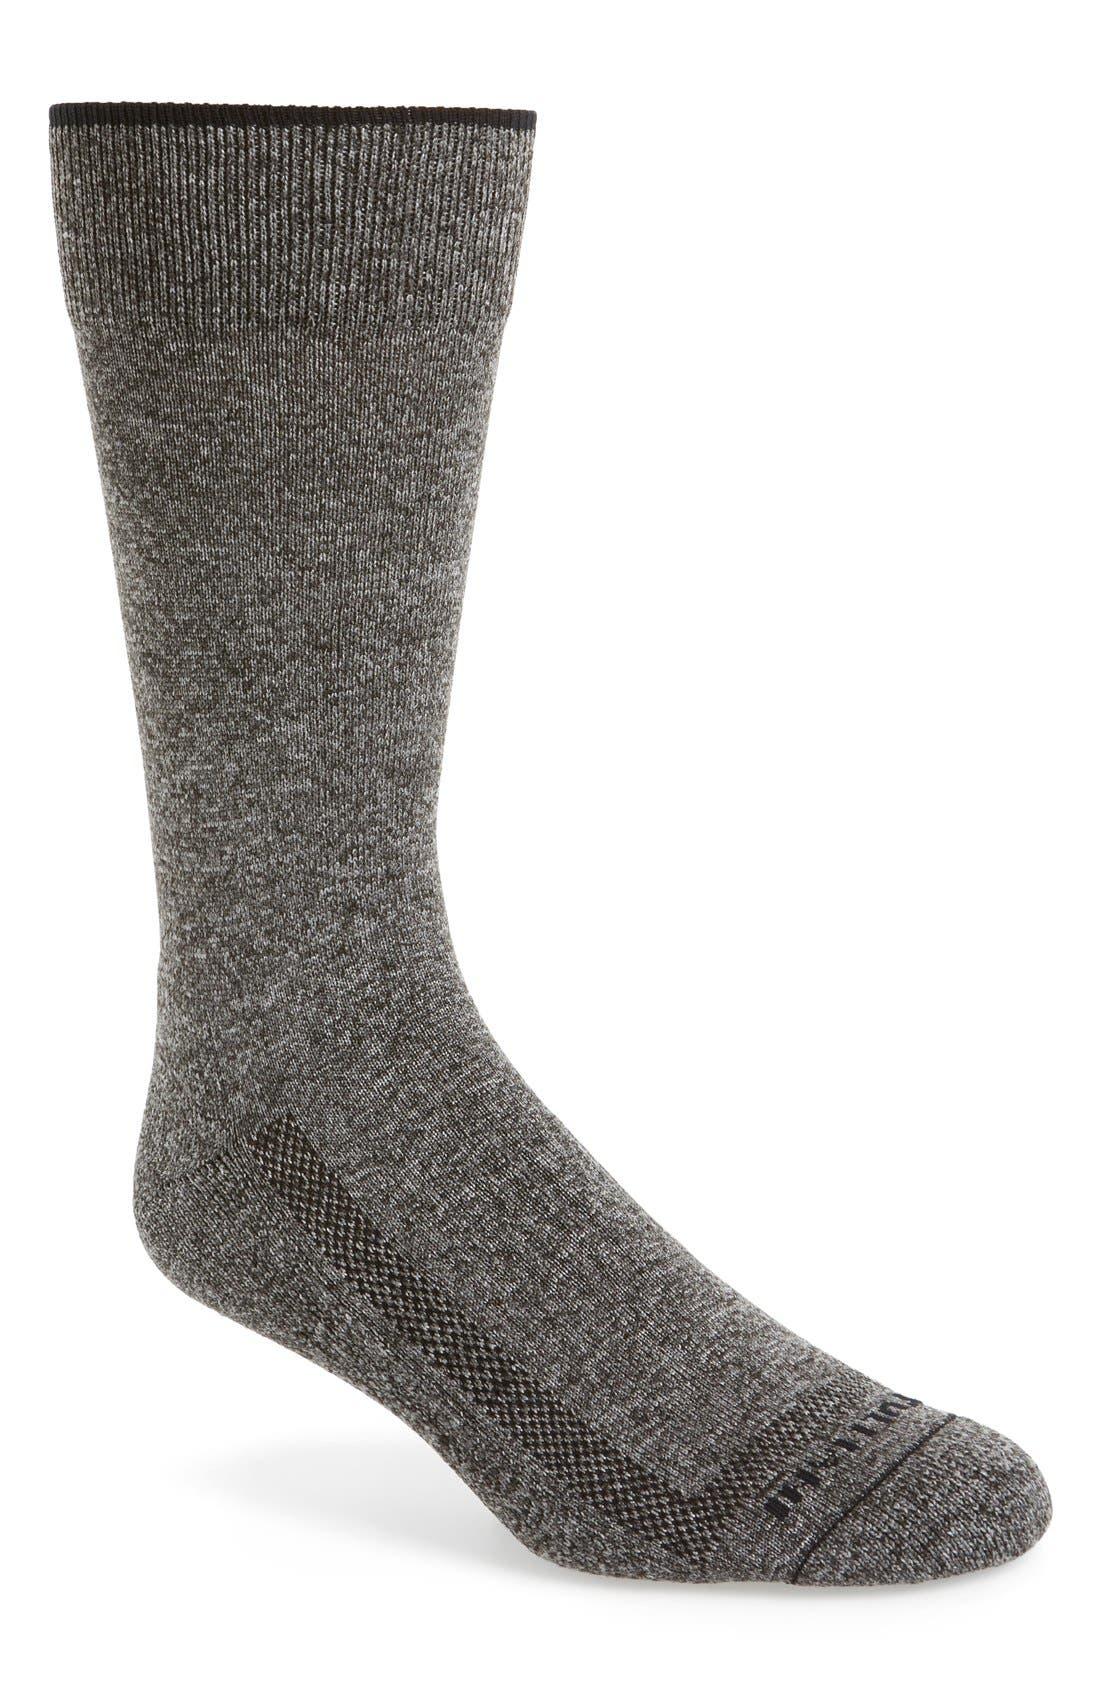 'Pima' Socks,                             Main thumbnail 1, color,                             020